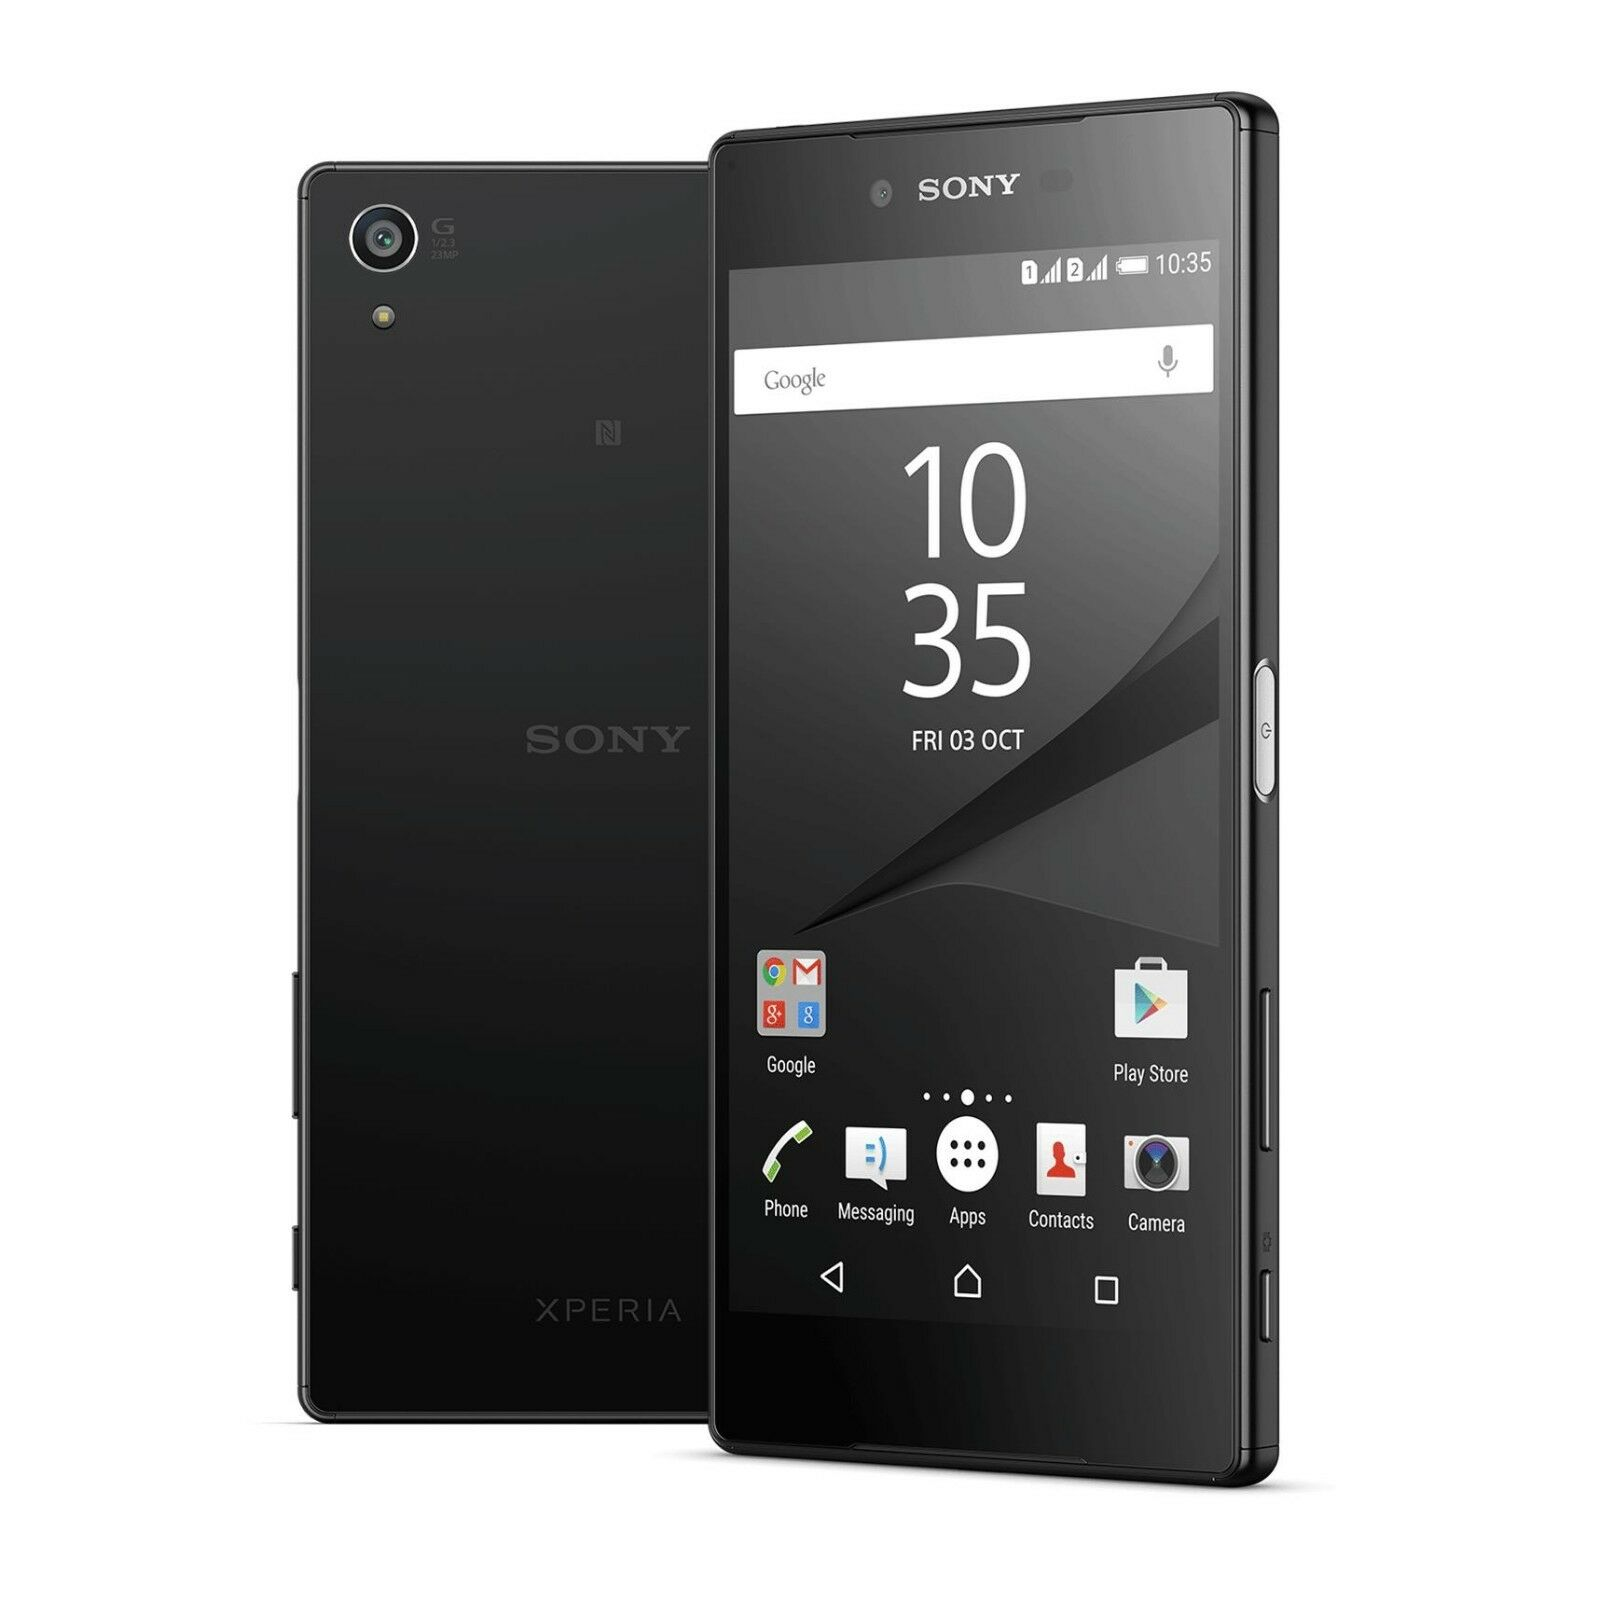 Sony Xperia Z5 - 32GB - Graphite Black (Unlocked) Smartphone